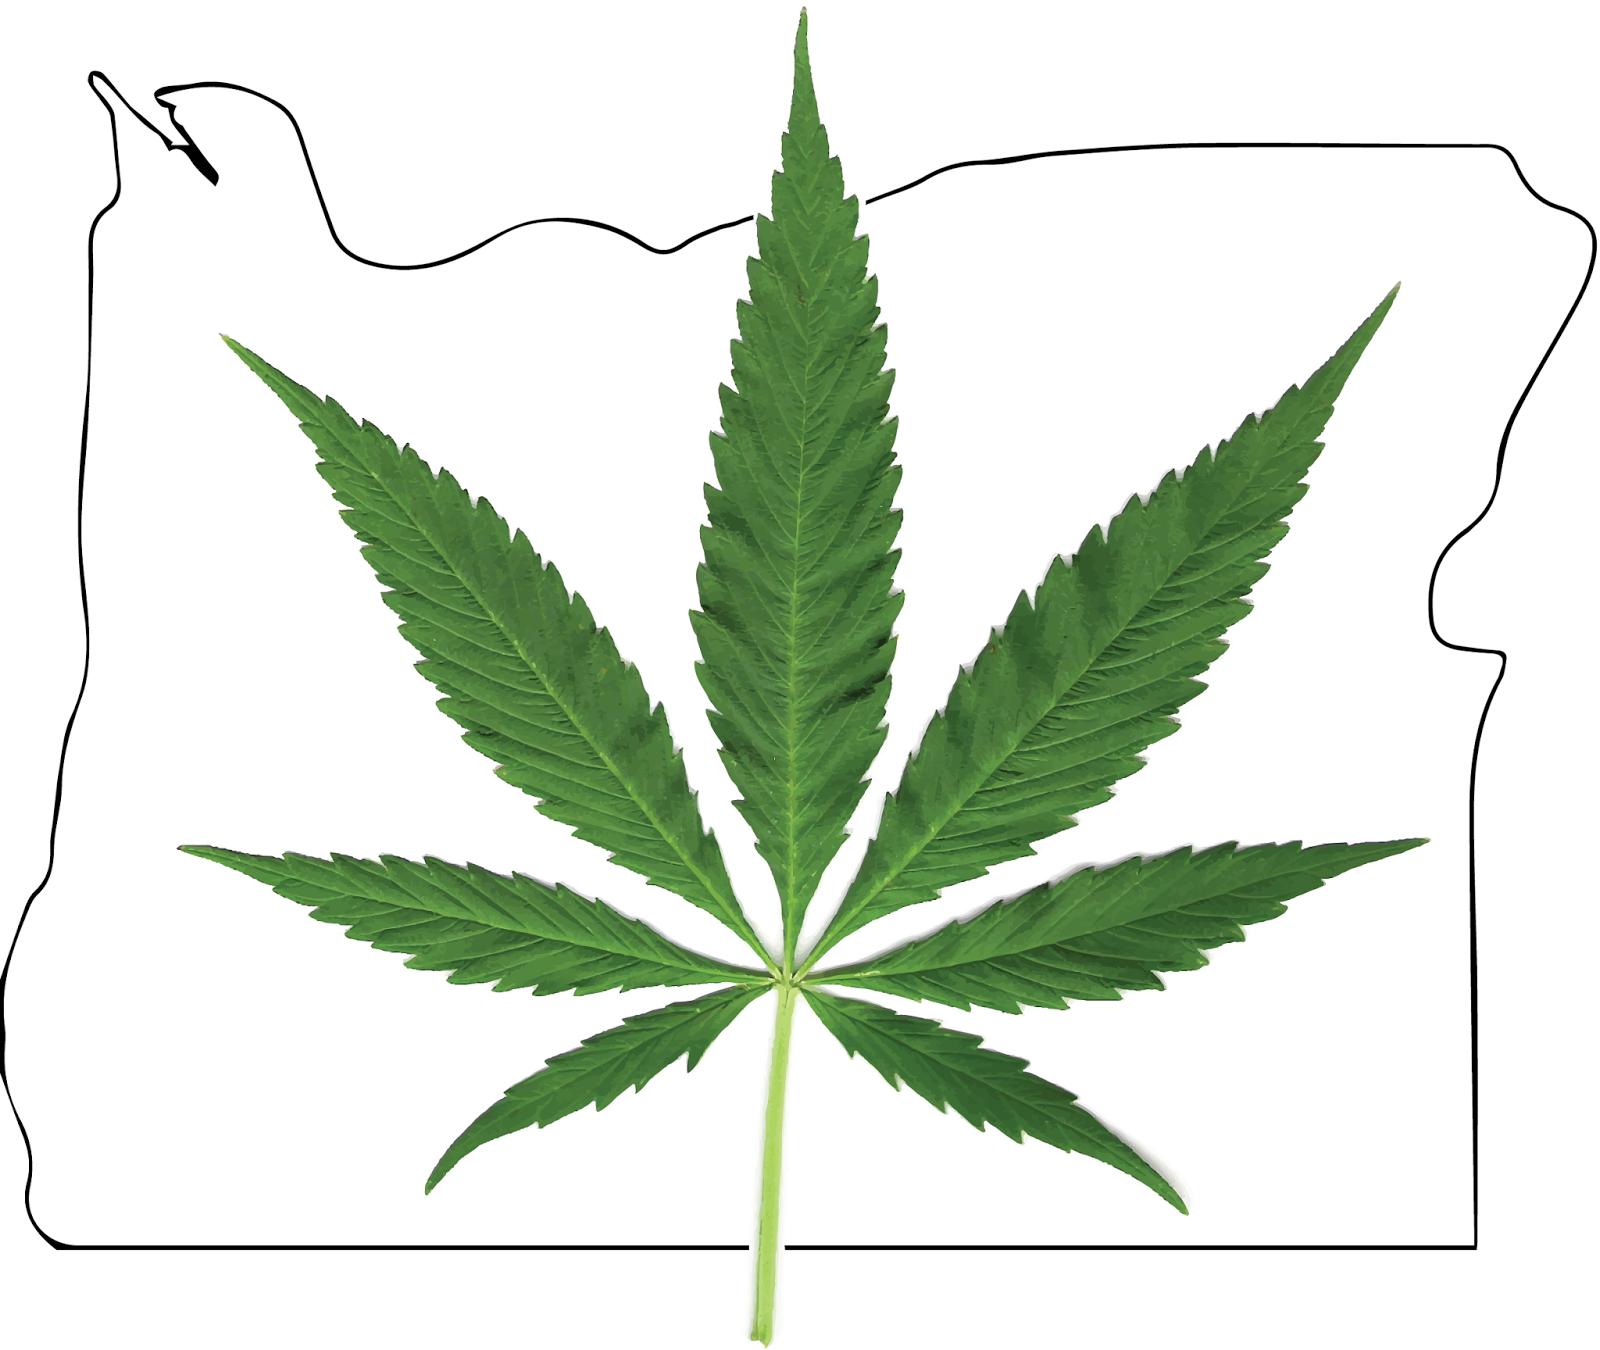 Portdaddia: Marijuana Shops' Names Entertain Kids Despite Glowering